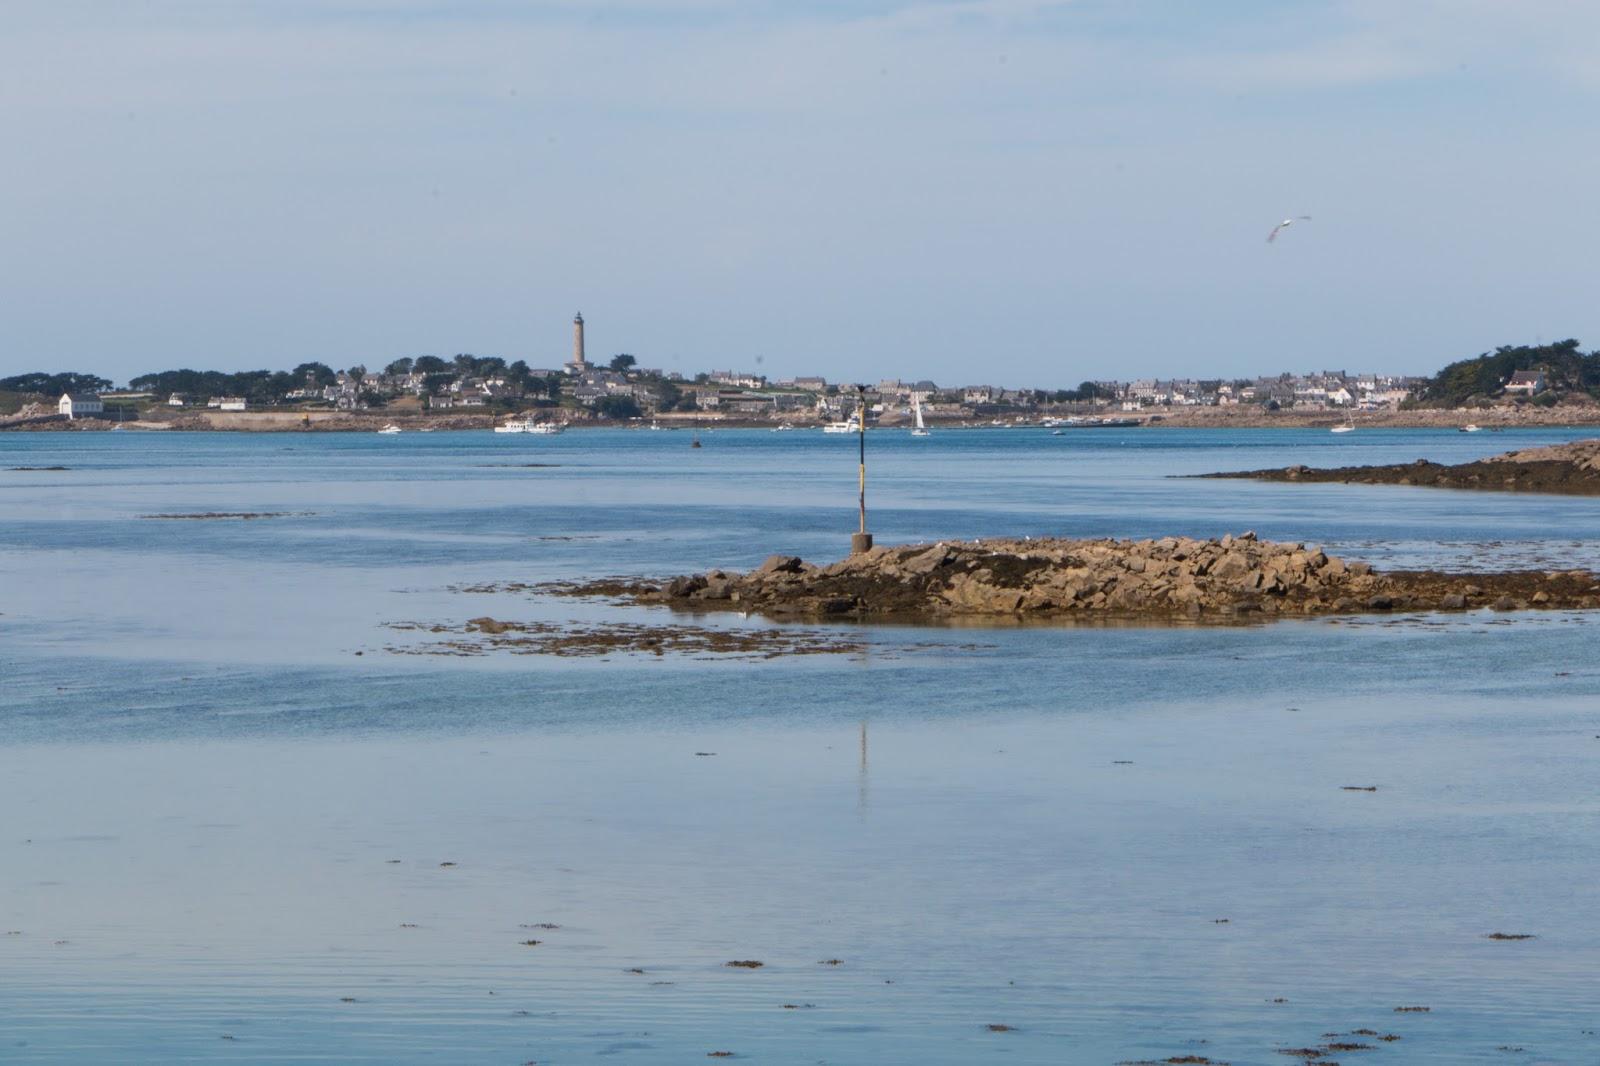 Nisia Iles De Toutes Les Mers Bretagne Ile De Batz Jardin